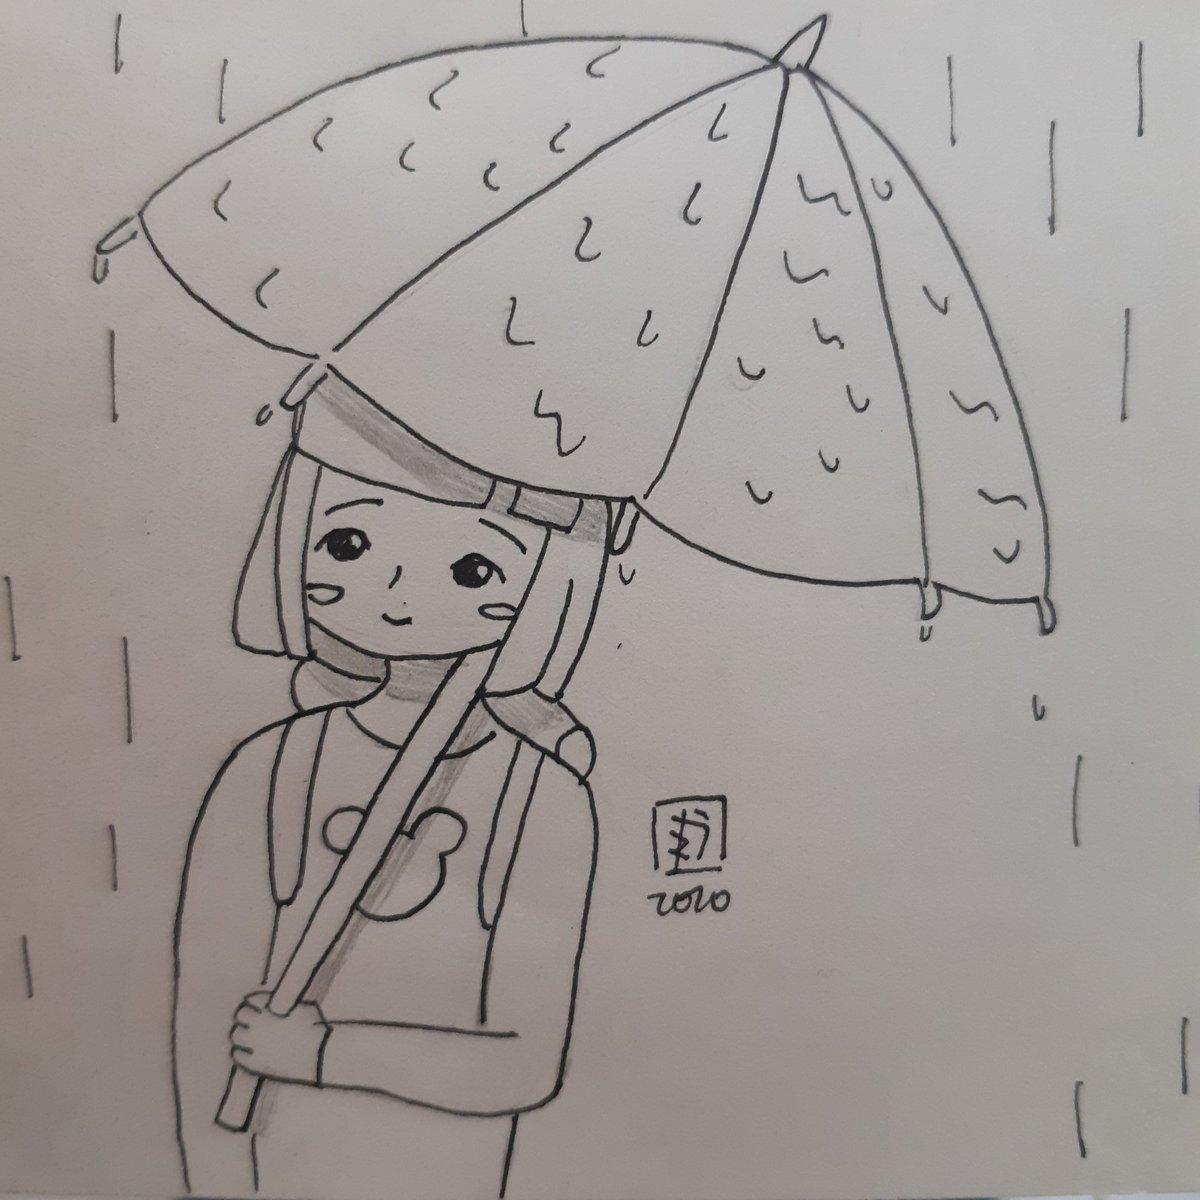 Segundos antes do vento  #drawing #desenho #ink #unipin #nanquim #originalcharacter #oc #dailymoments #dailyart #rain #chuvapic.twitter.com/oLVt5gN27t